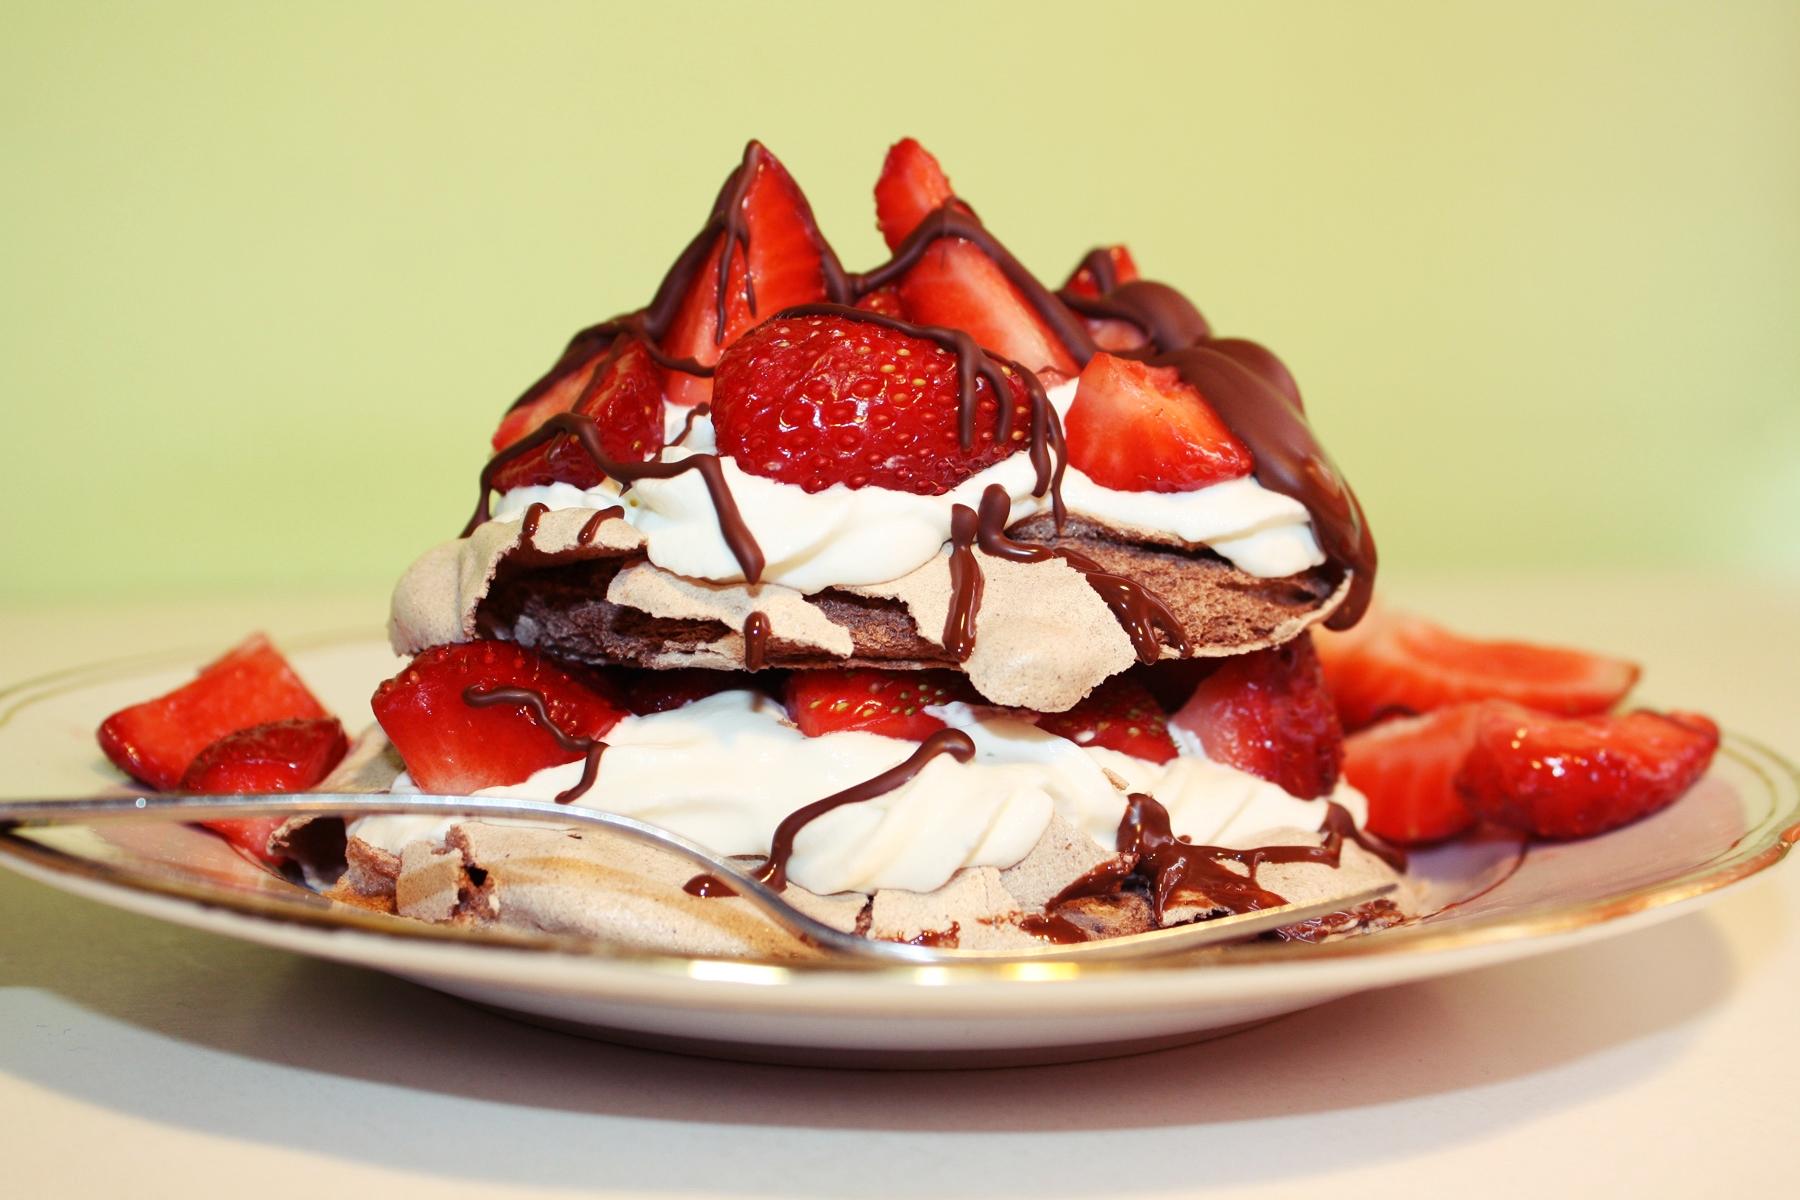 mini-pavlova-with-strawberries_w2